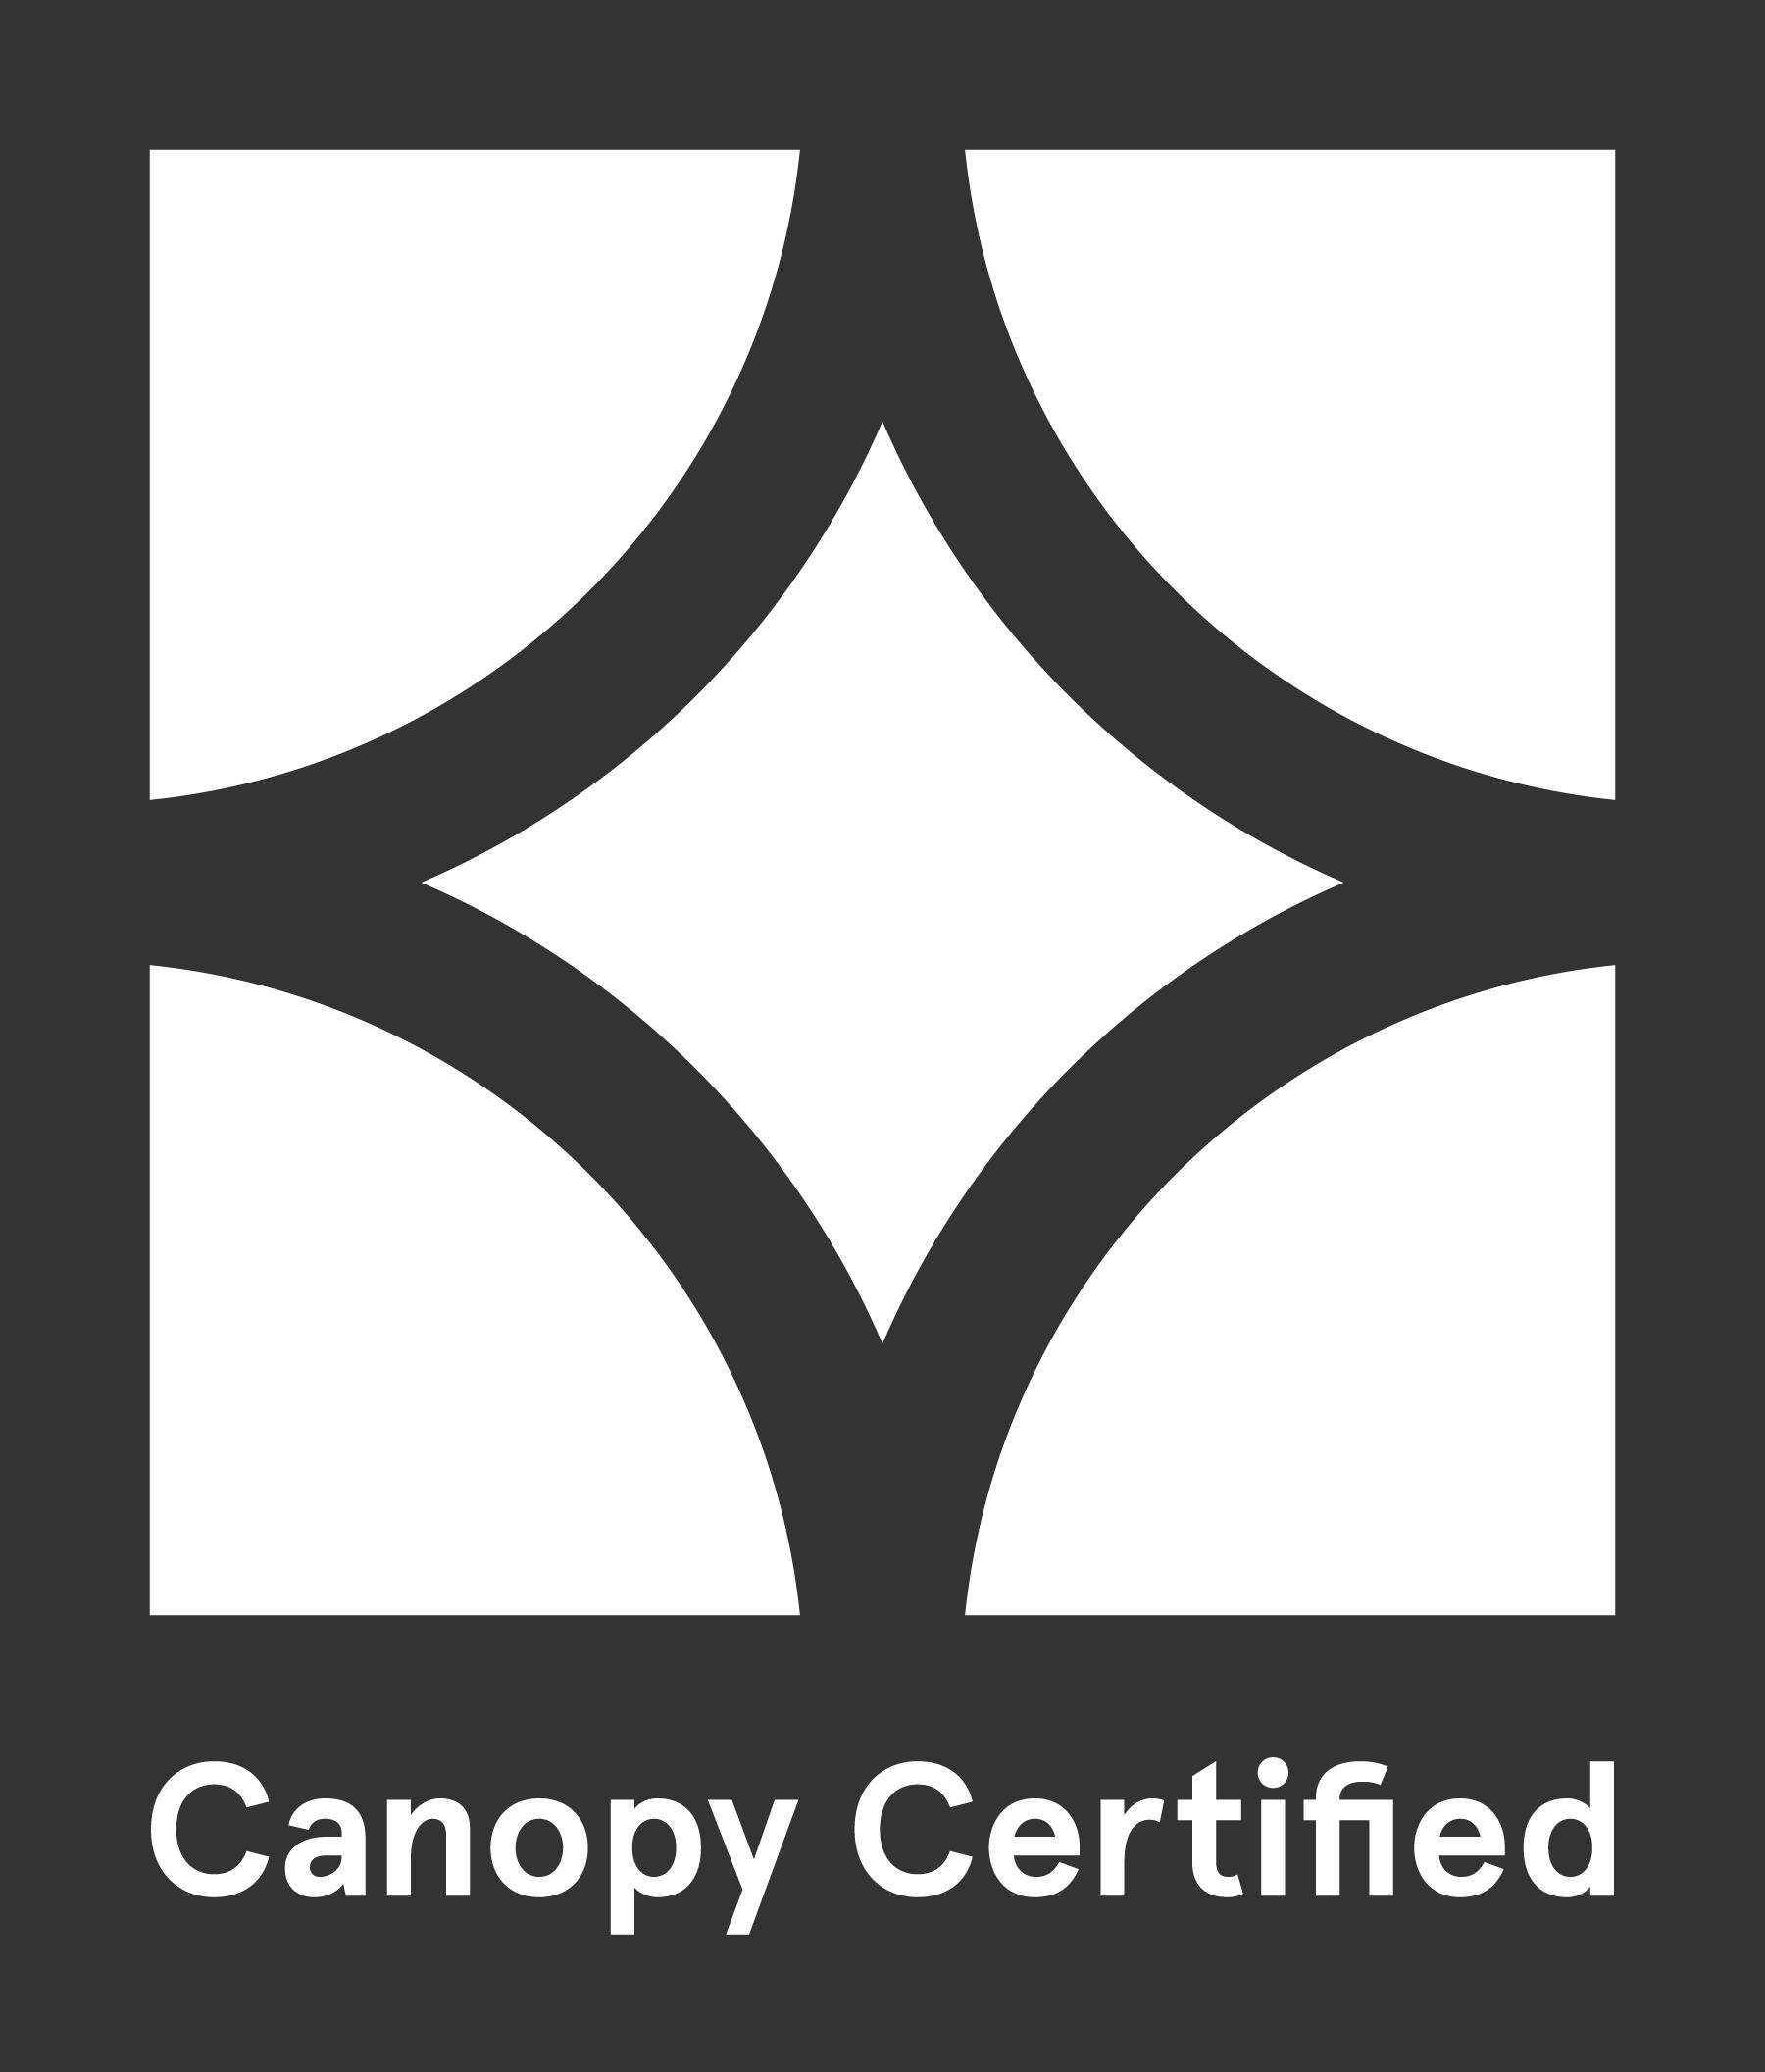 canopy seal